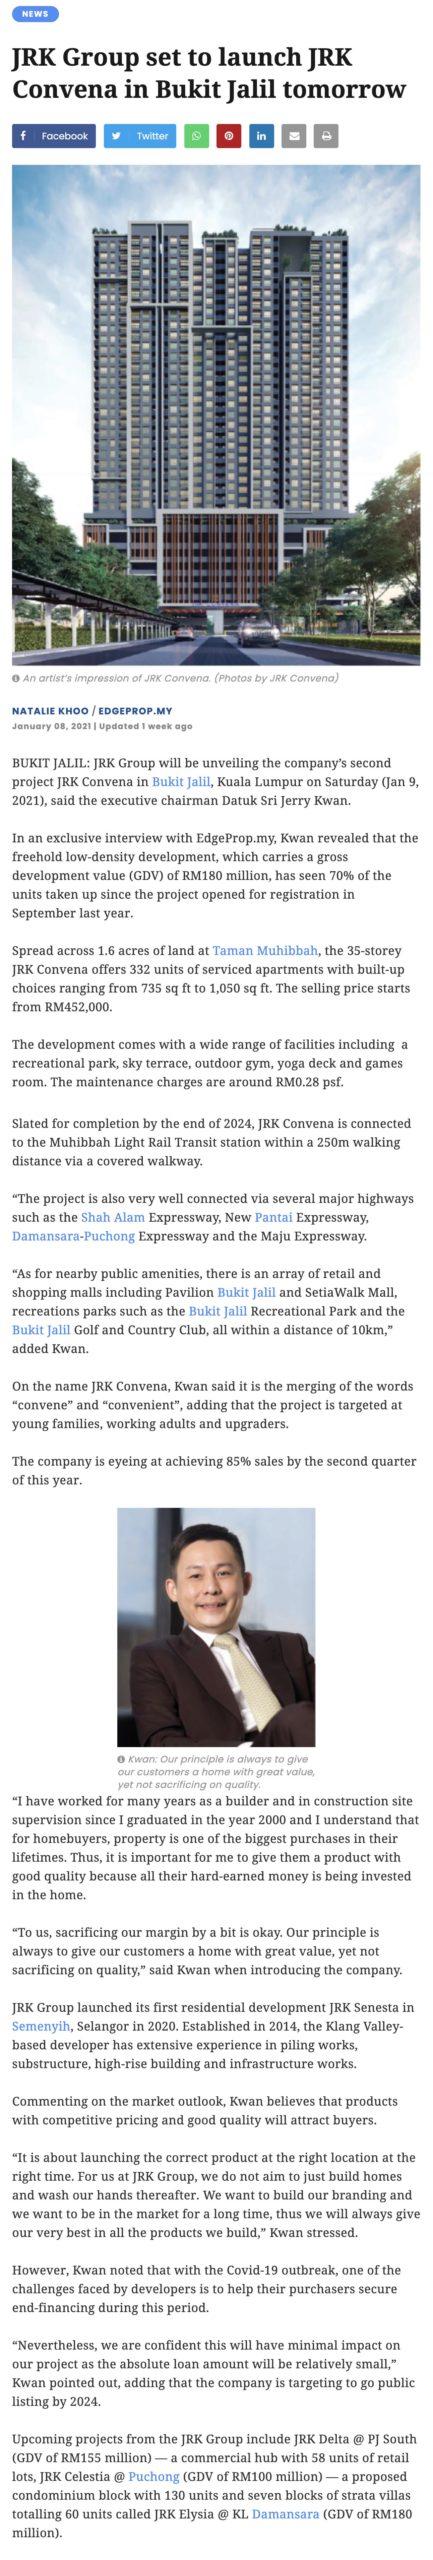 JRK Group set to launch JRK Convena in Bukit Jalil tomorrow